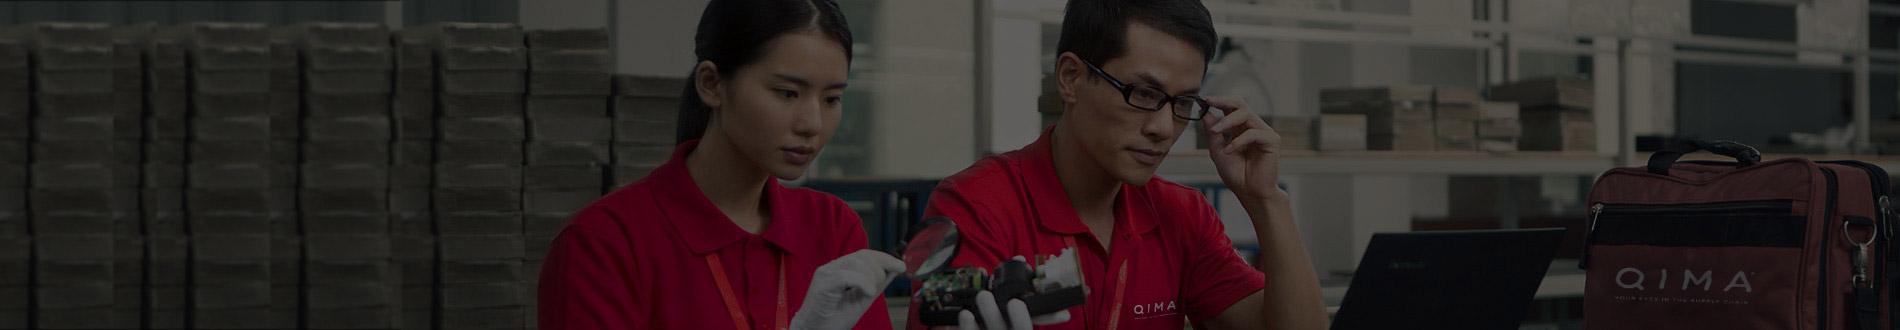 Hardlines - Quality Control in Manufacturing | QIMA